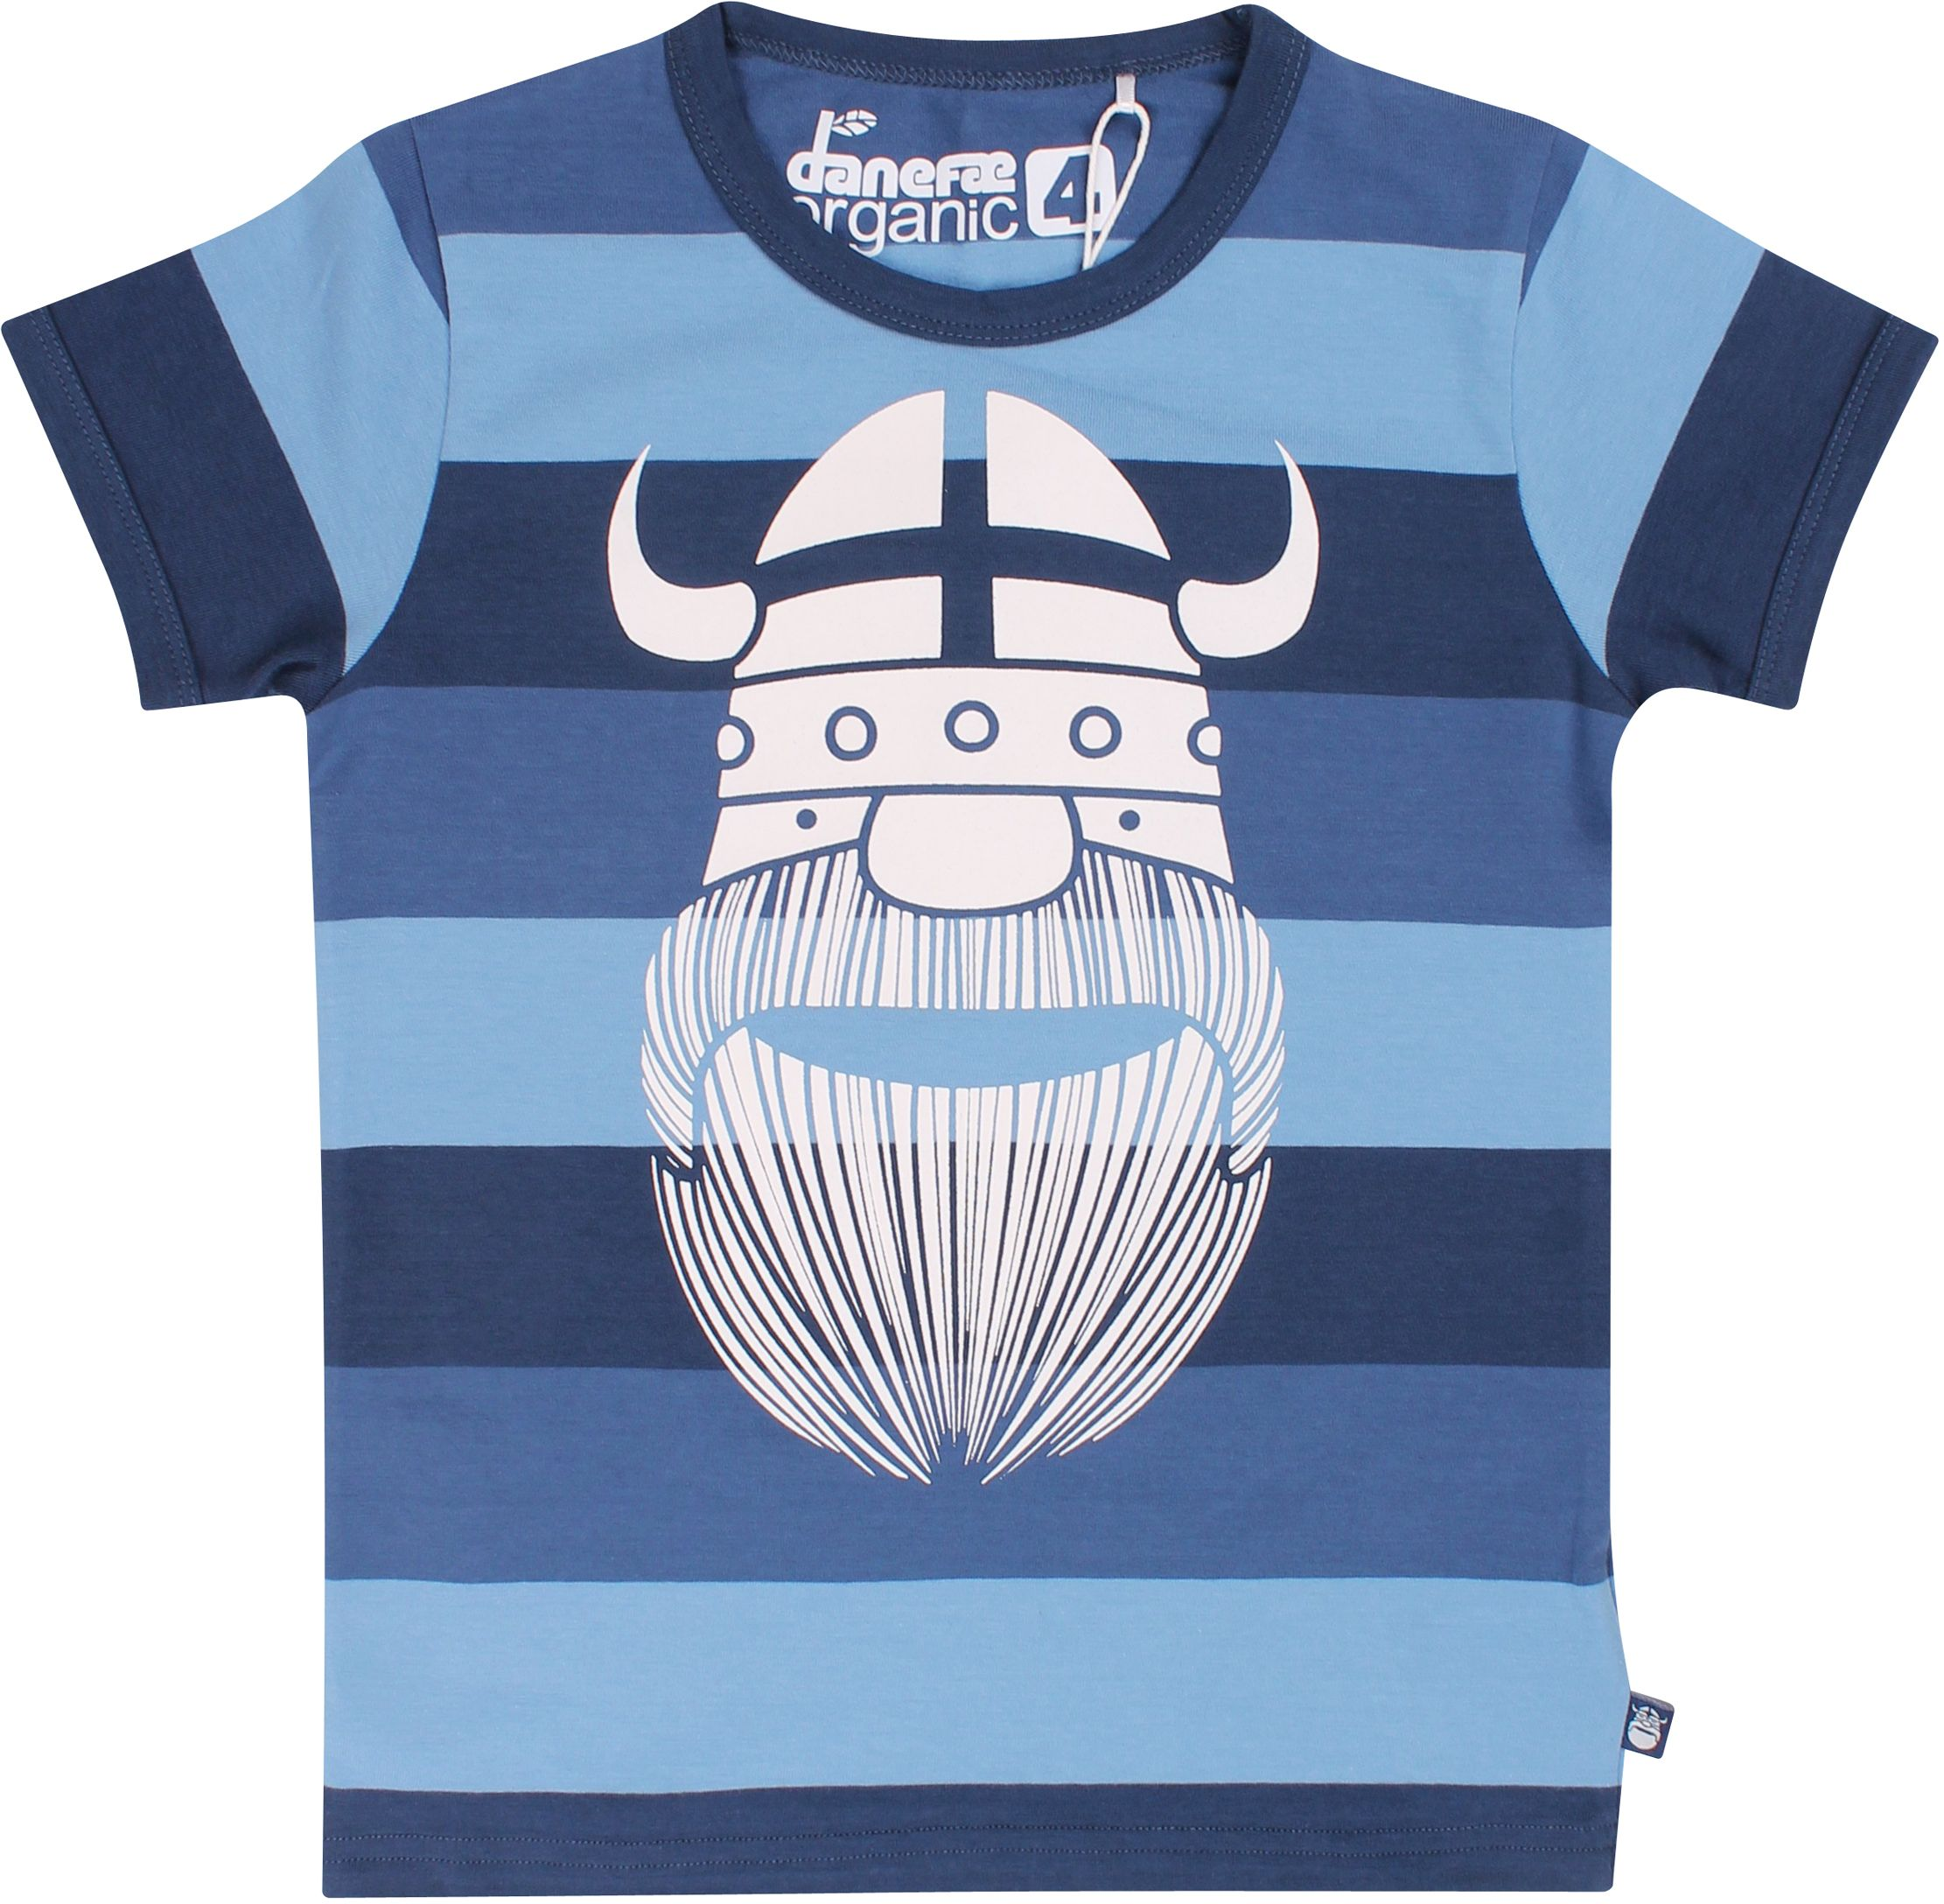 Danefae Boy T-Shirt Organic Chives gloomy